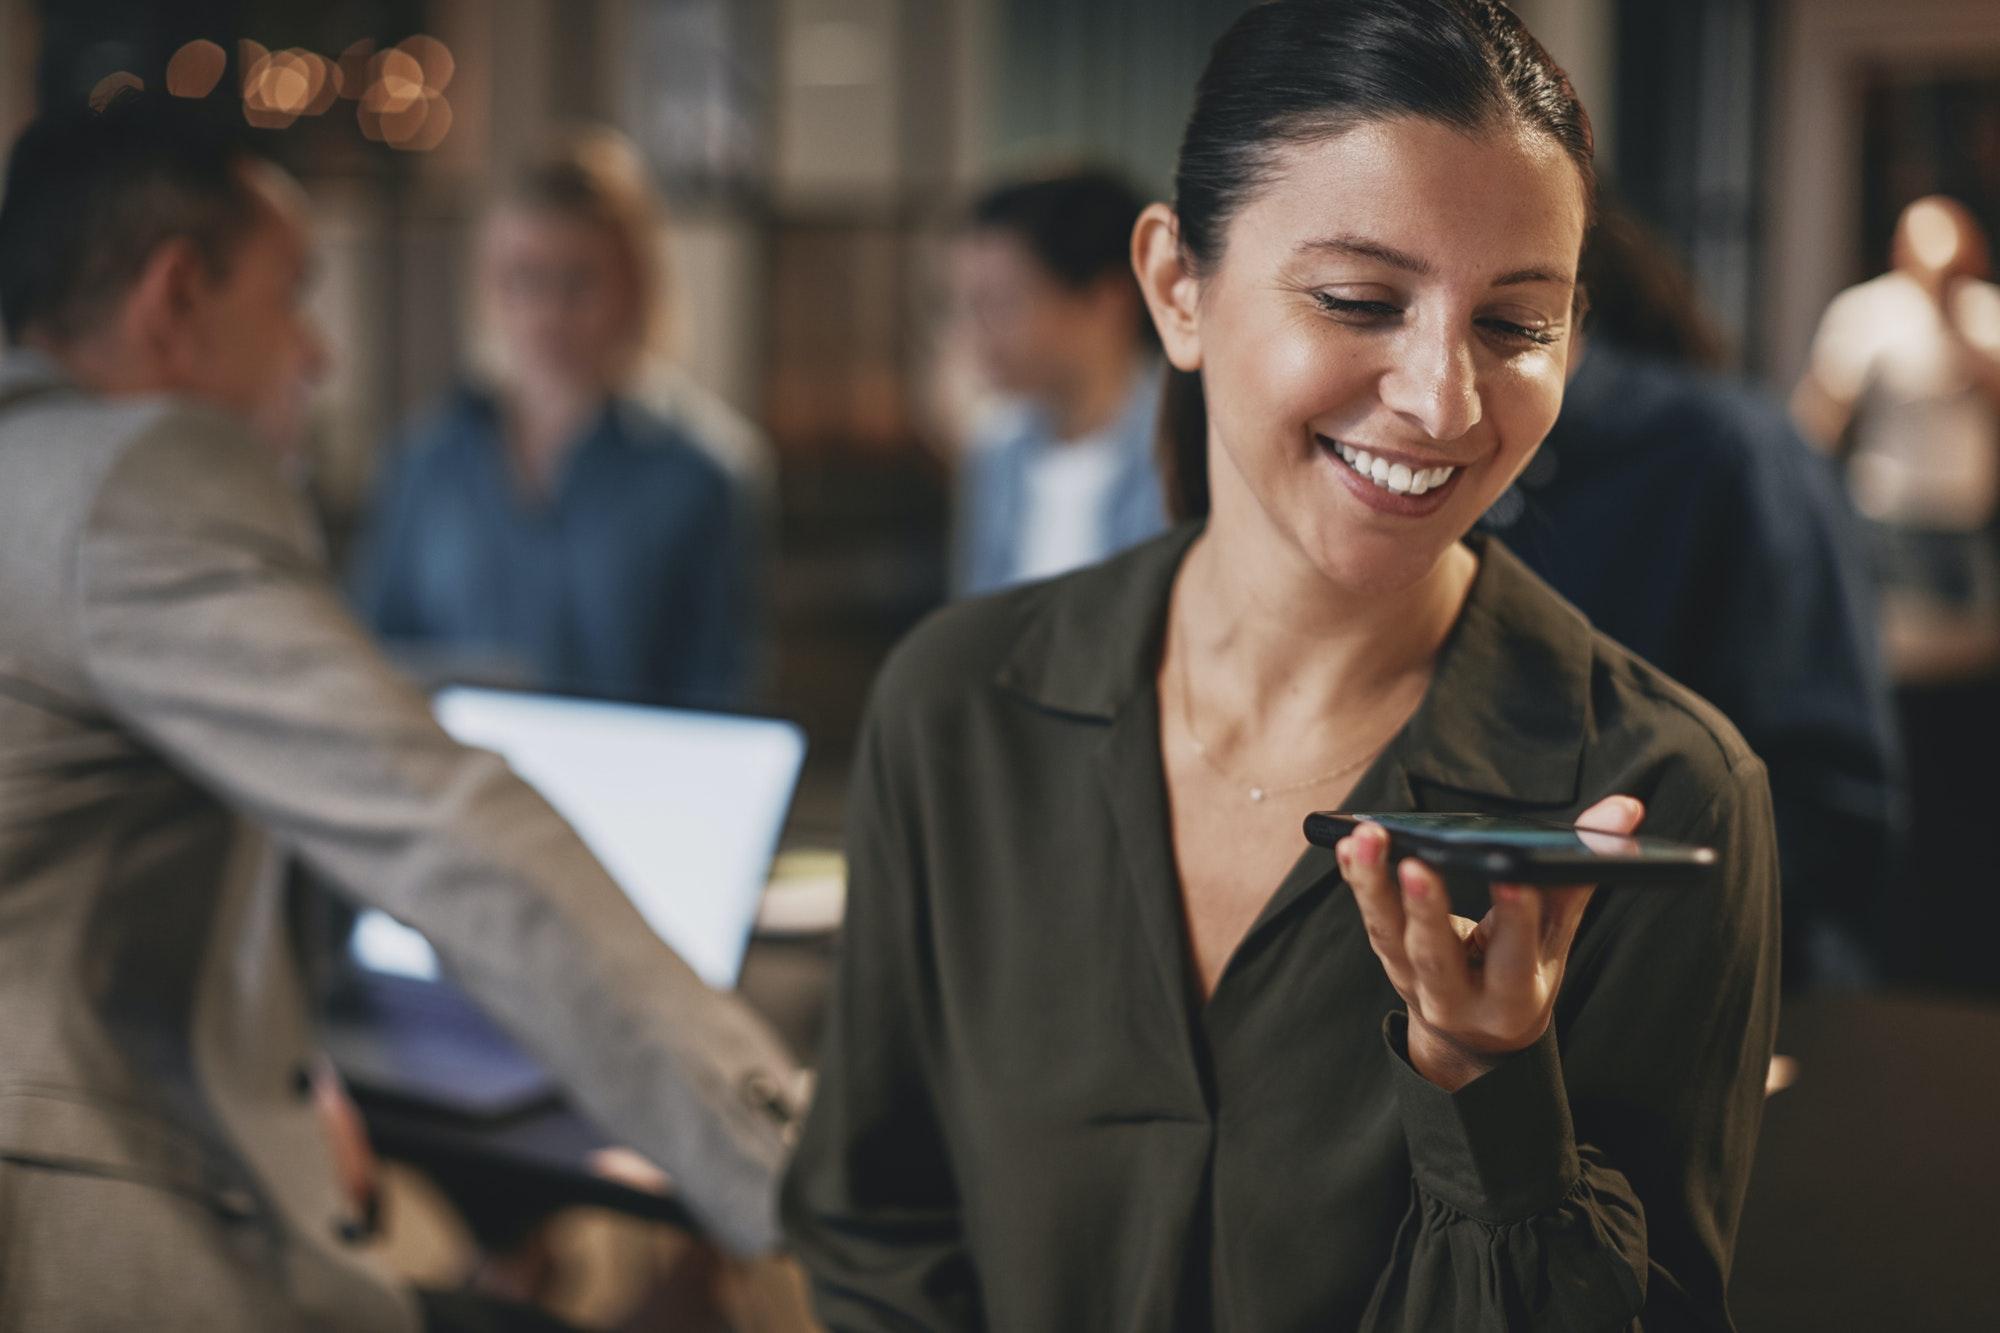 Smiling businesswoman talking on speakerphone in an office